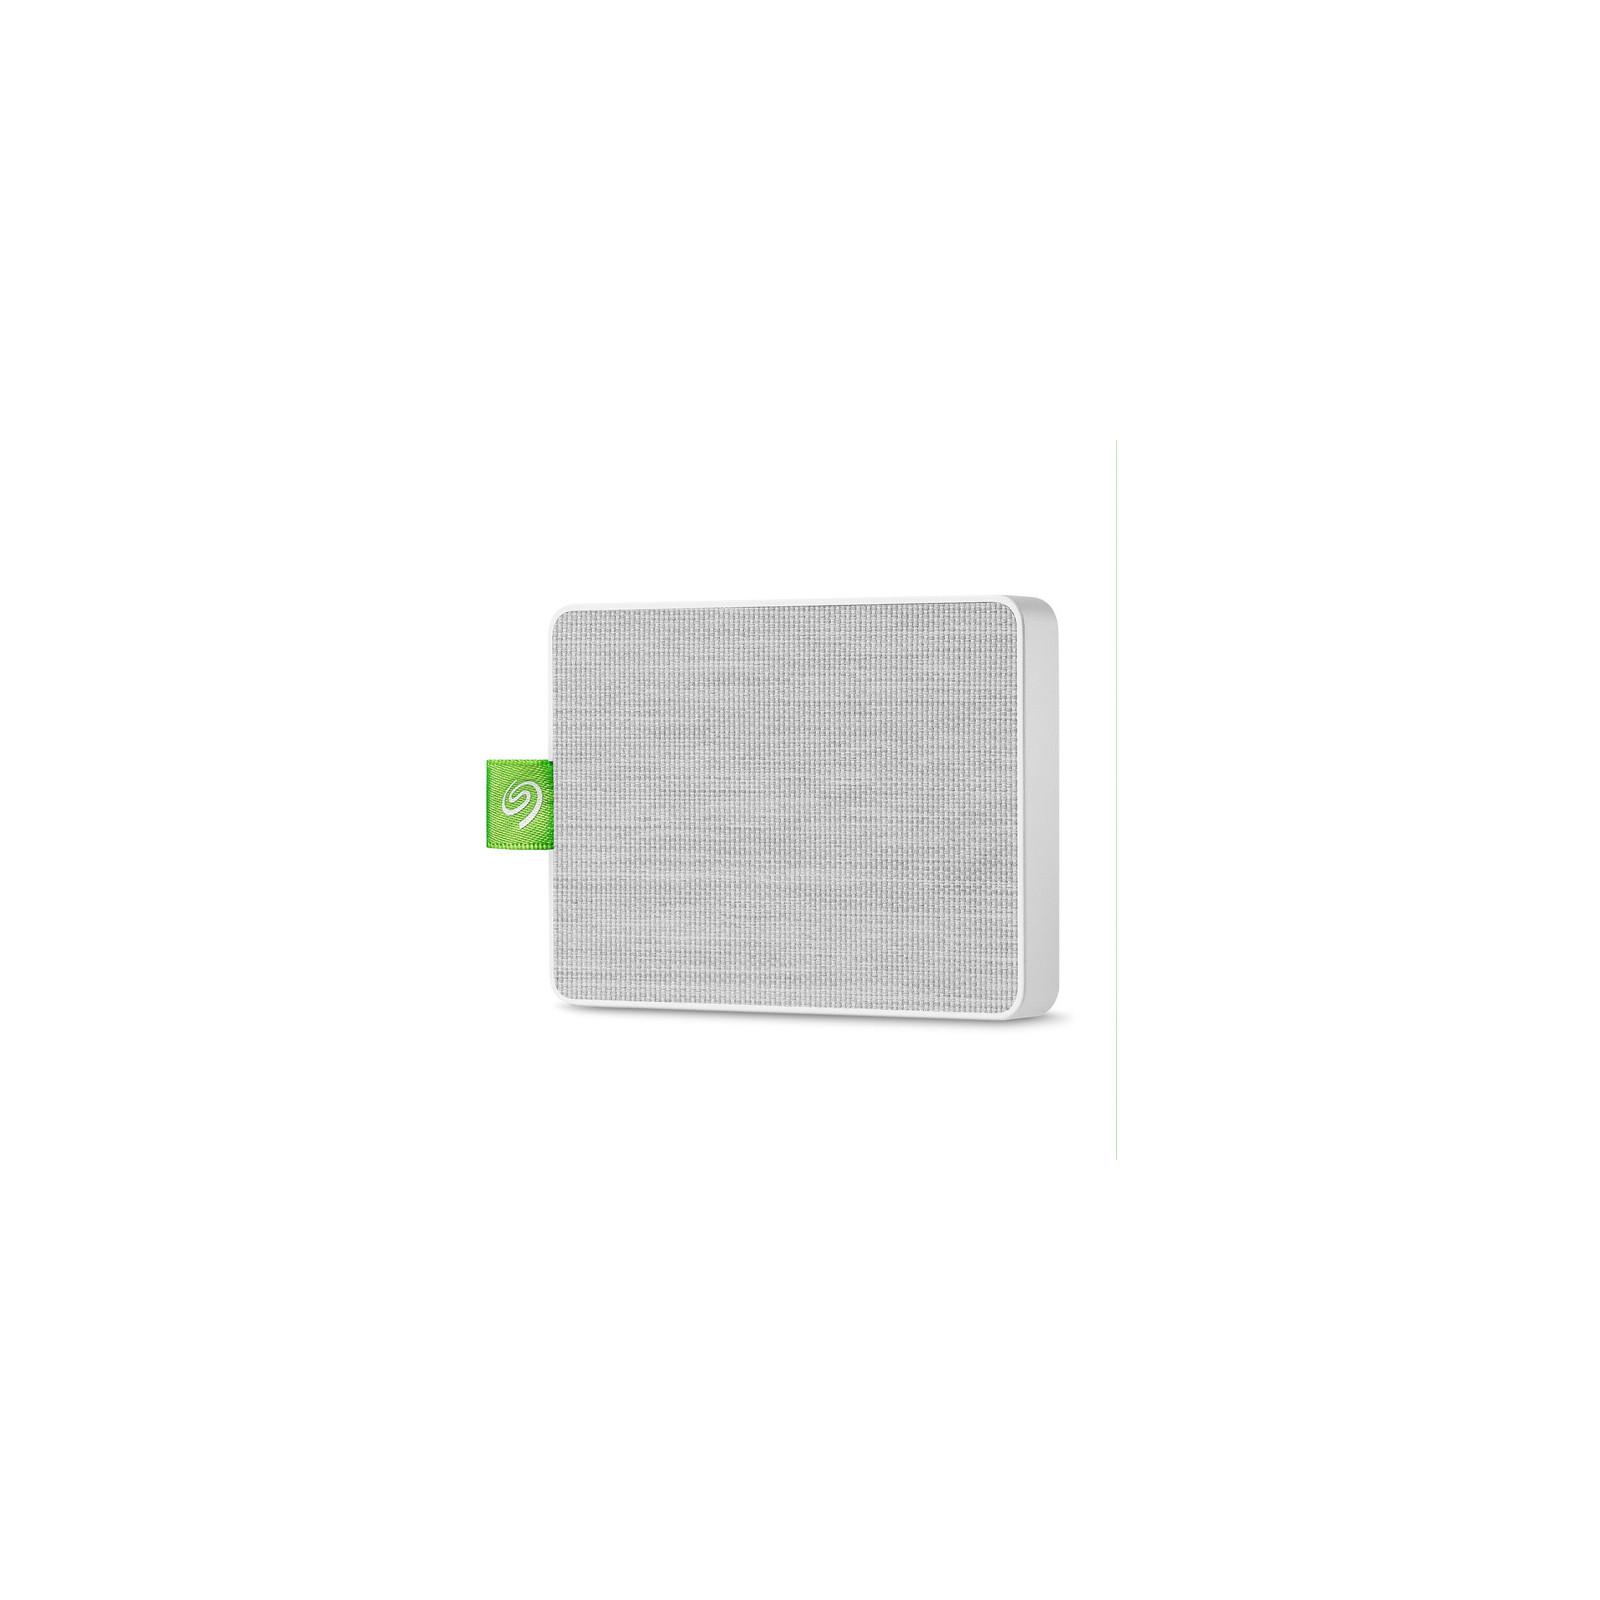 Seagate Ultra Touch SSD 500GB extern USB 3.0 black